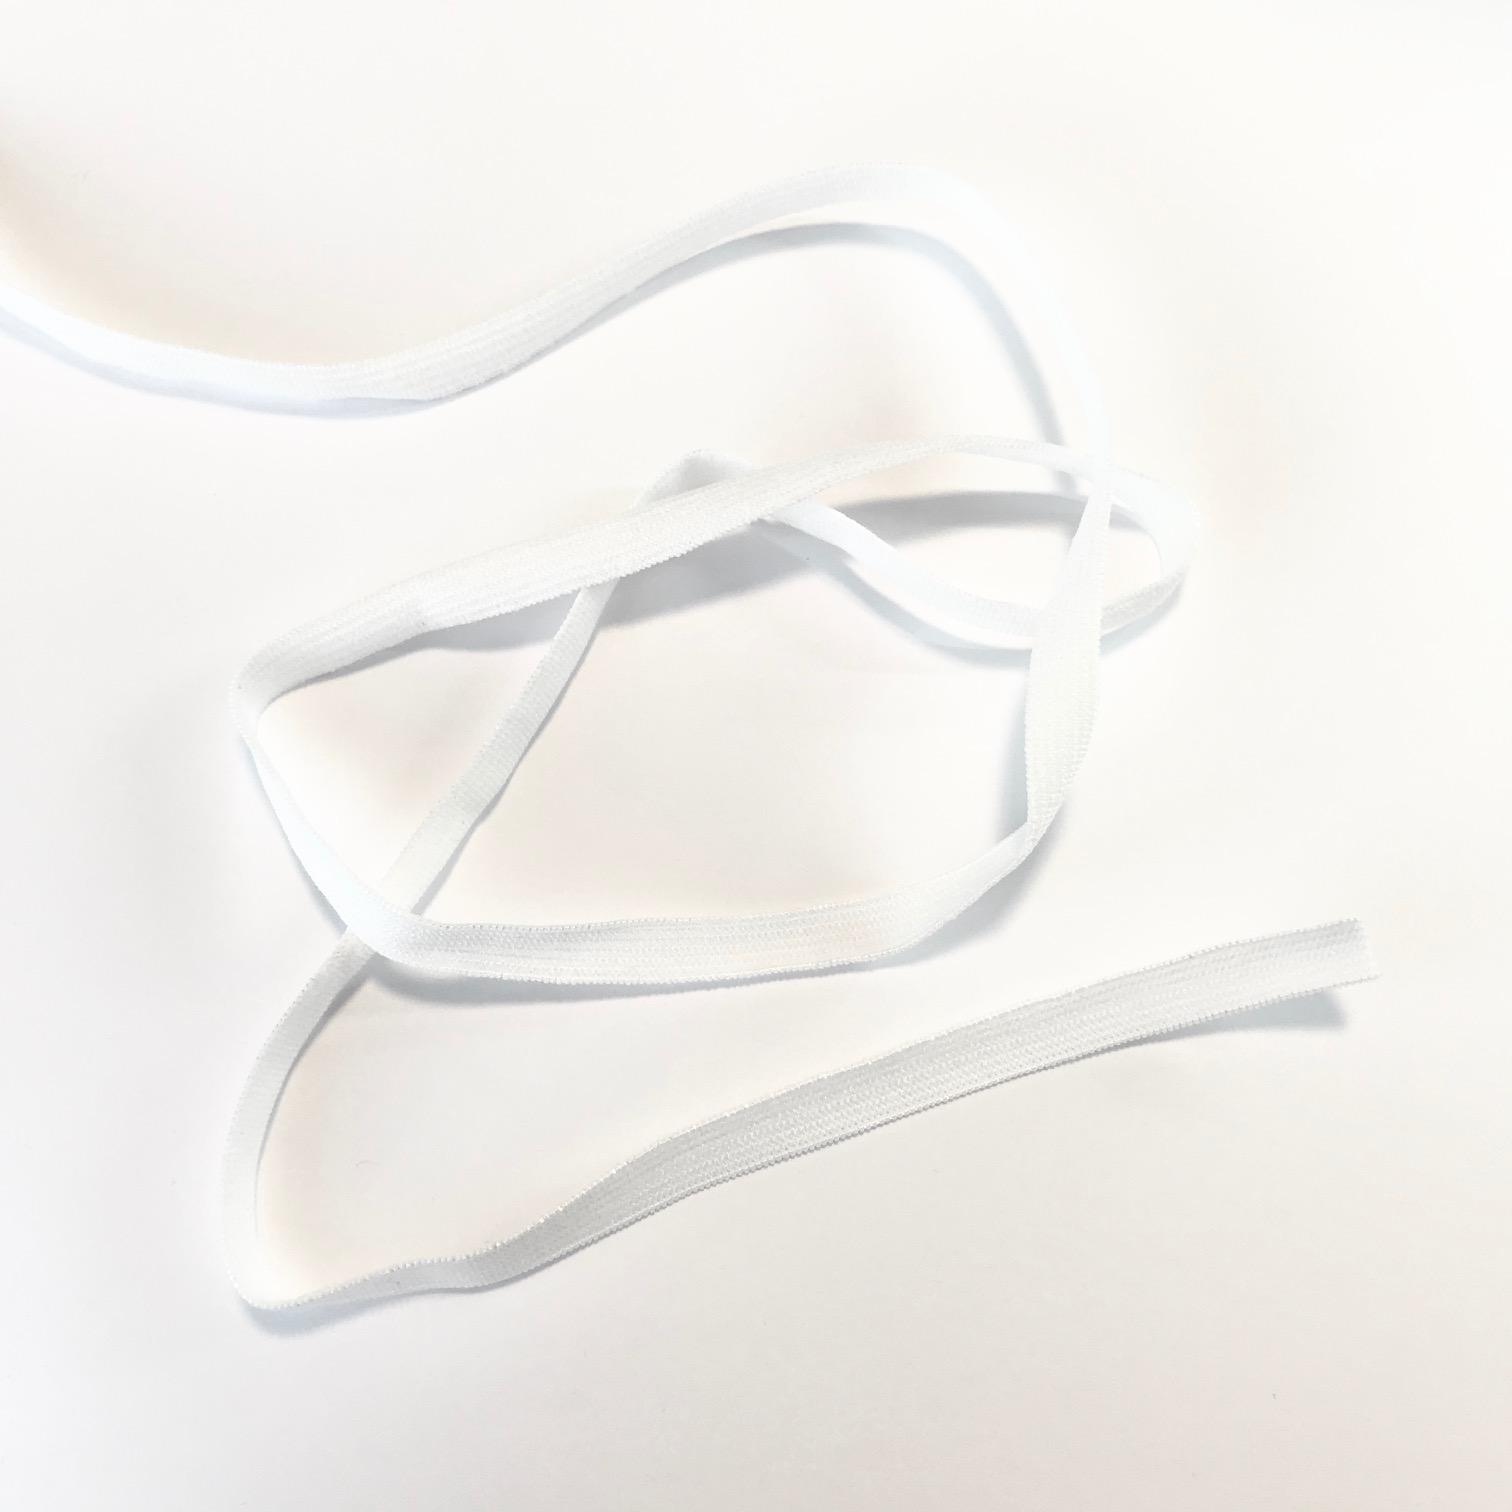 Elastique plat blanc 7mm ideal masque